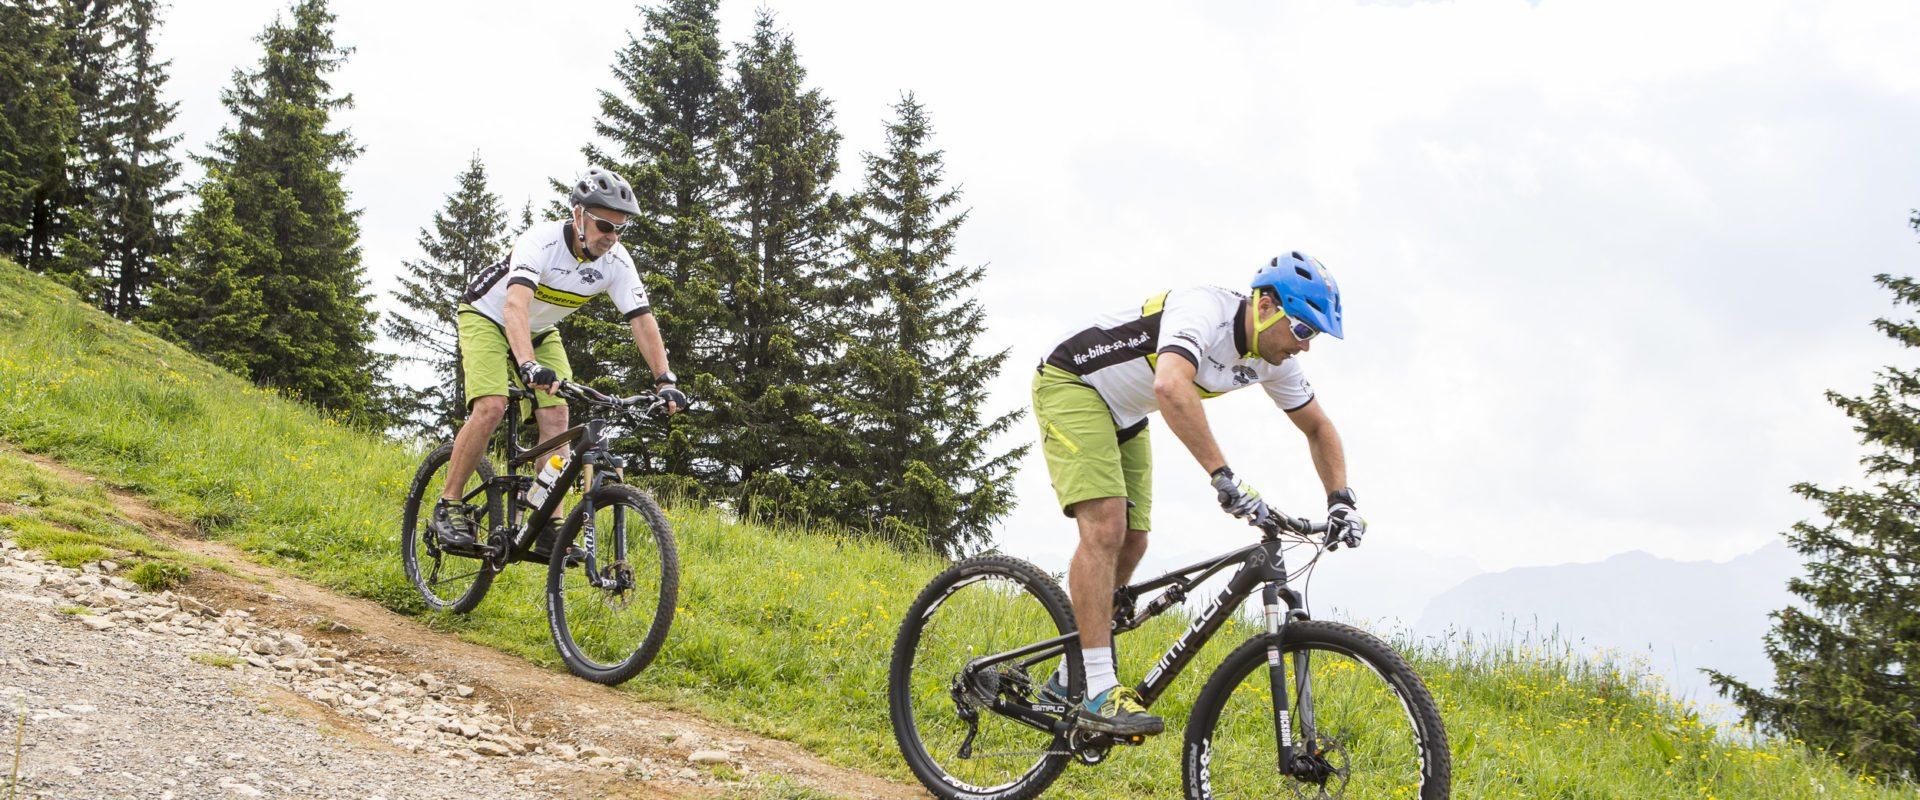 Mountainbike © Stephan Schatz / Bike Schule Au-Schoppernau